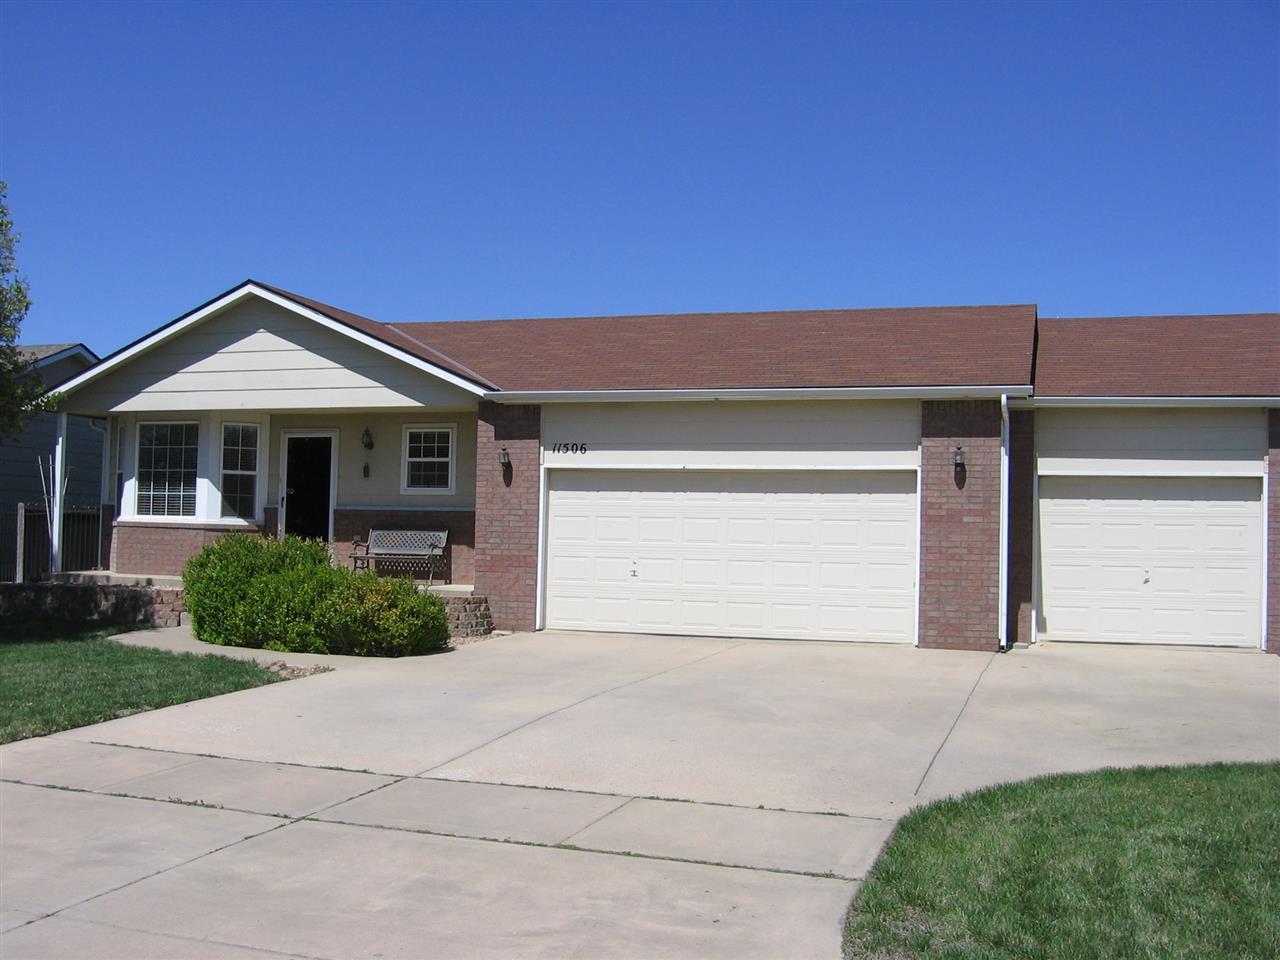 11506 W Grant, Wichita, KS 67209